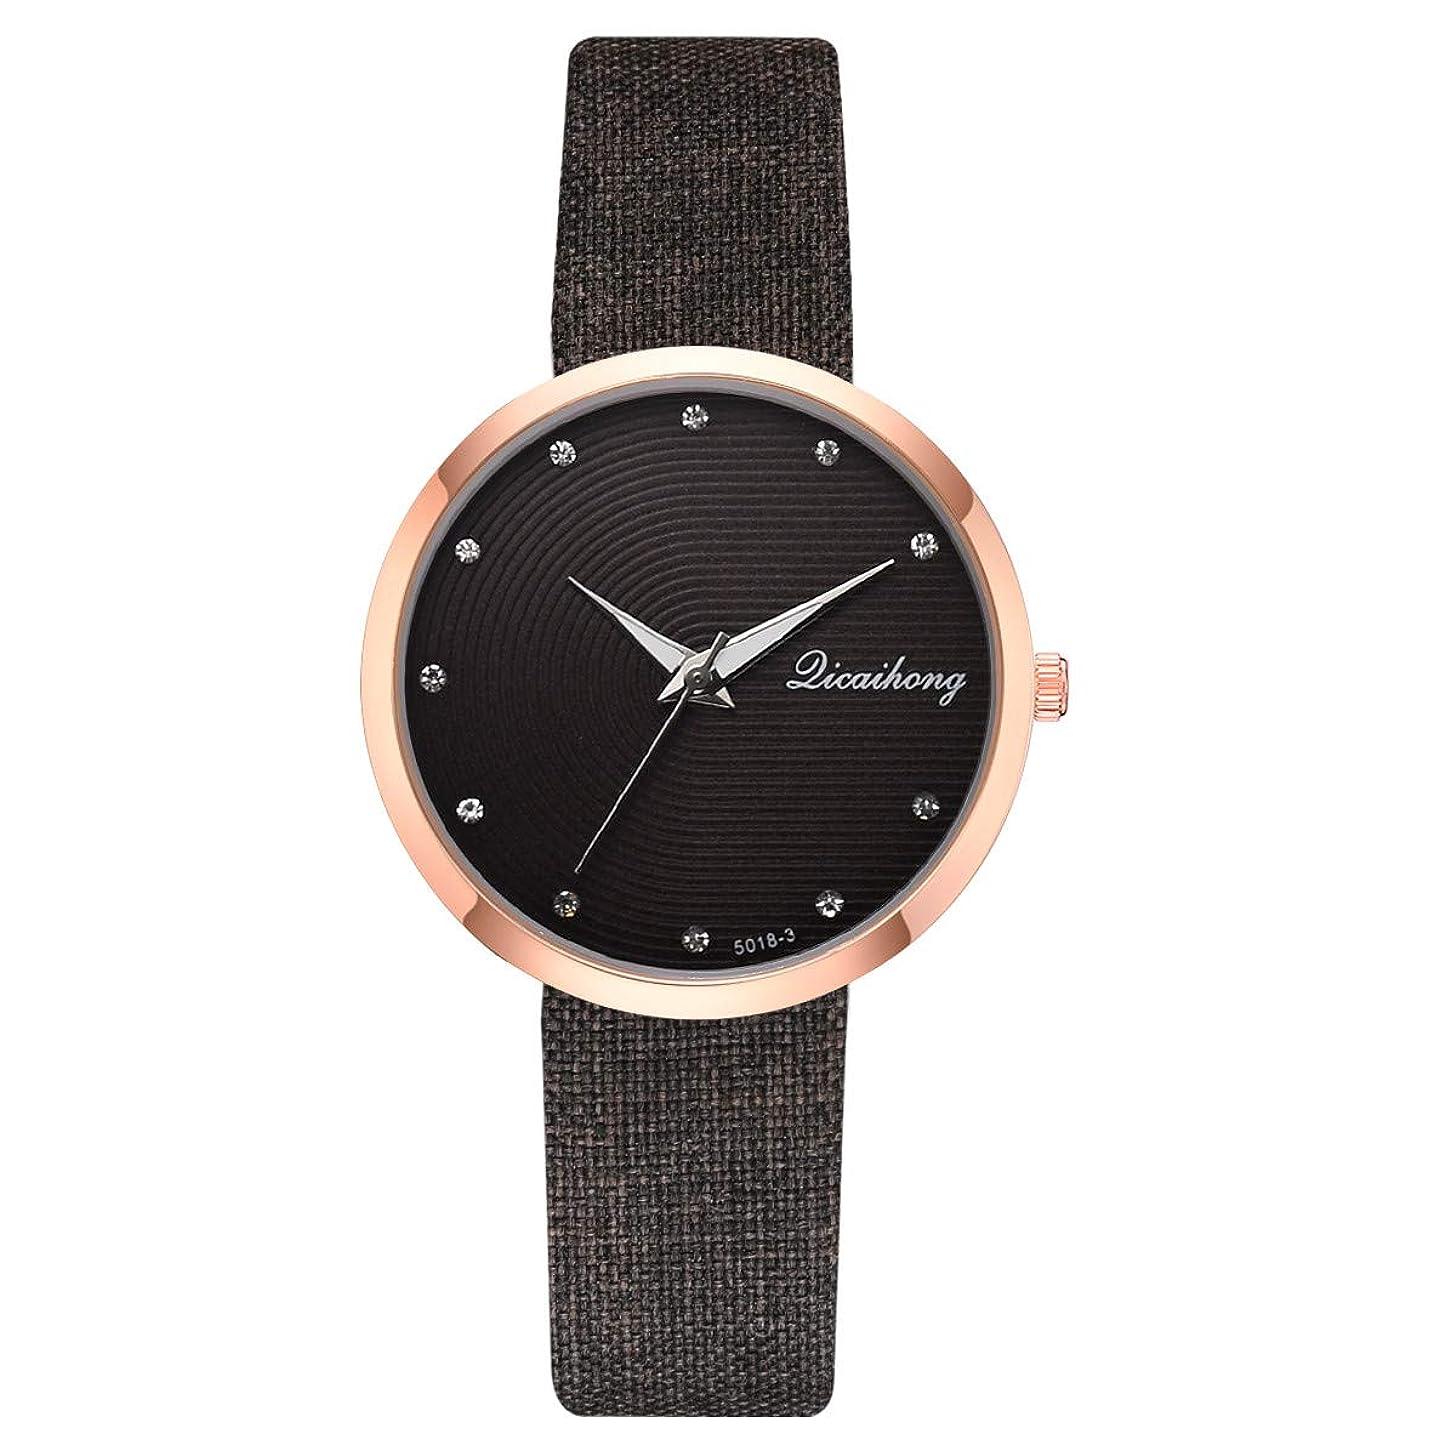 LUCAMORE Women Watches Leather Band Elegant Quartz Watches Girls Ladies Wristwatch